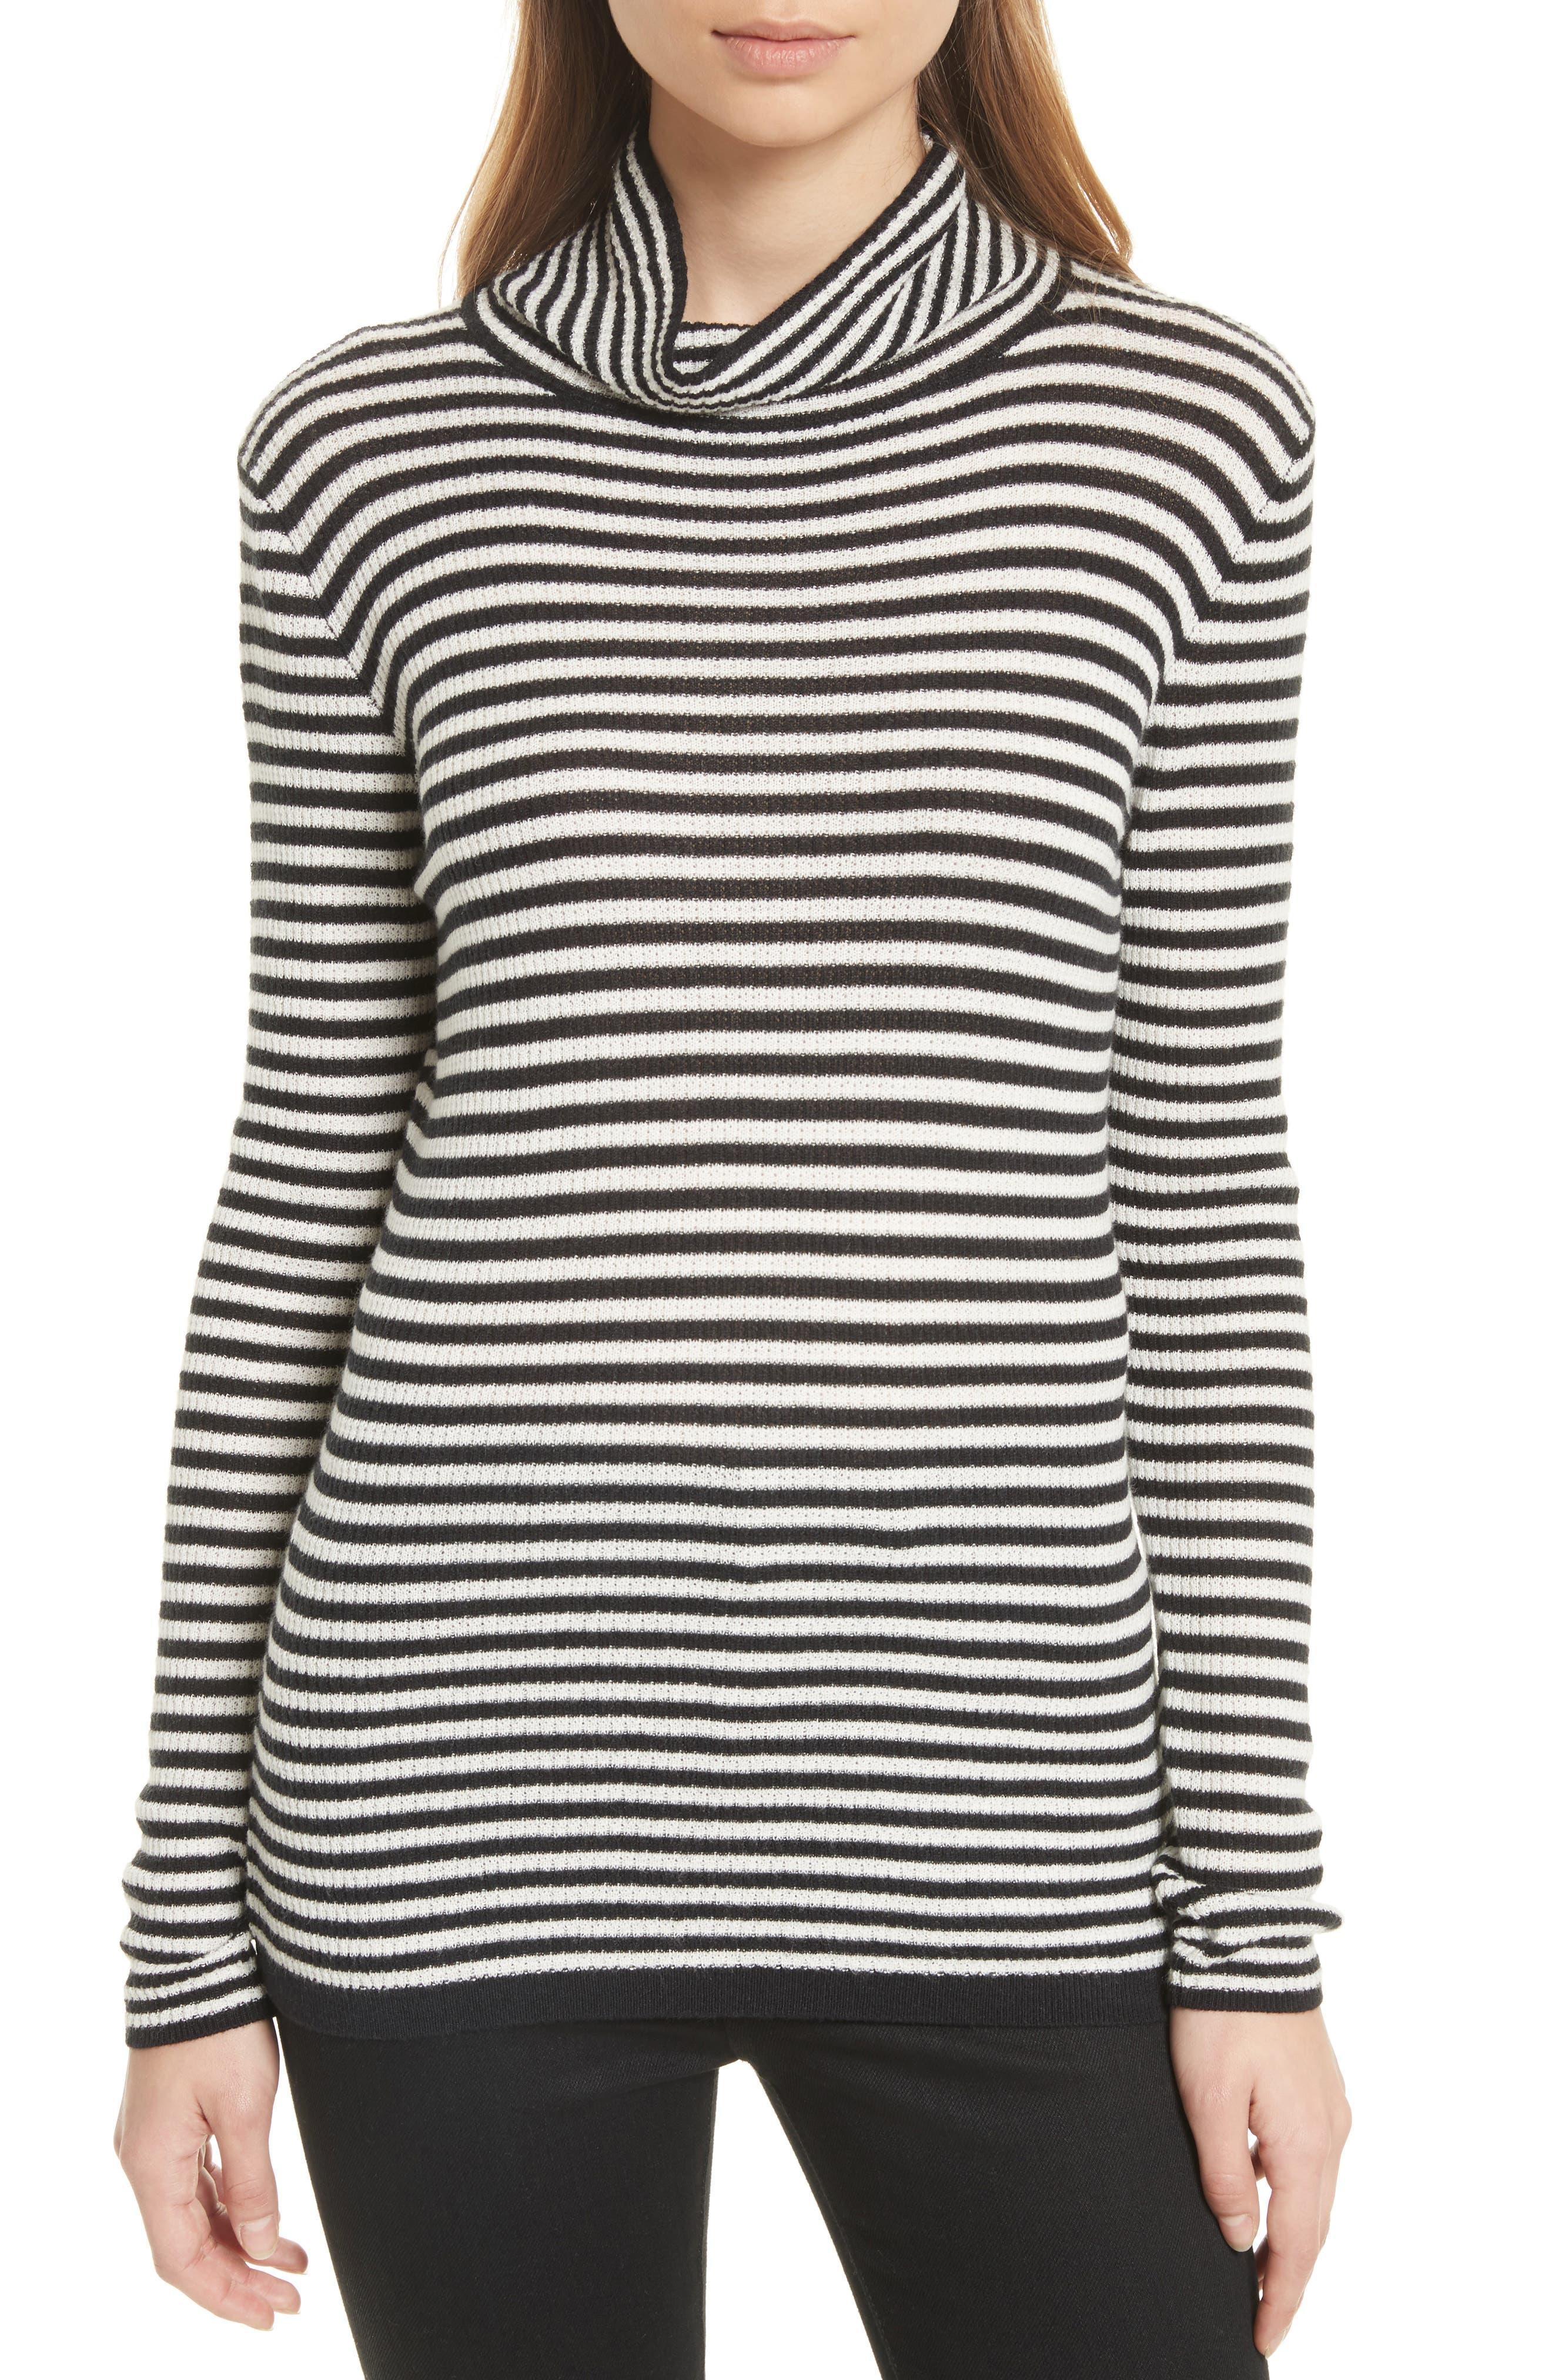 Zelene Stripe Cowl Neck Sweater,                             Main thumbnail 1, color,                             Caviar/ Porceclain